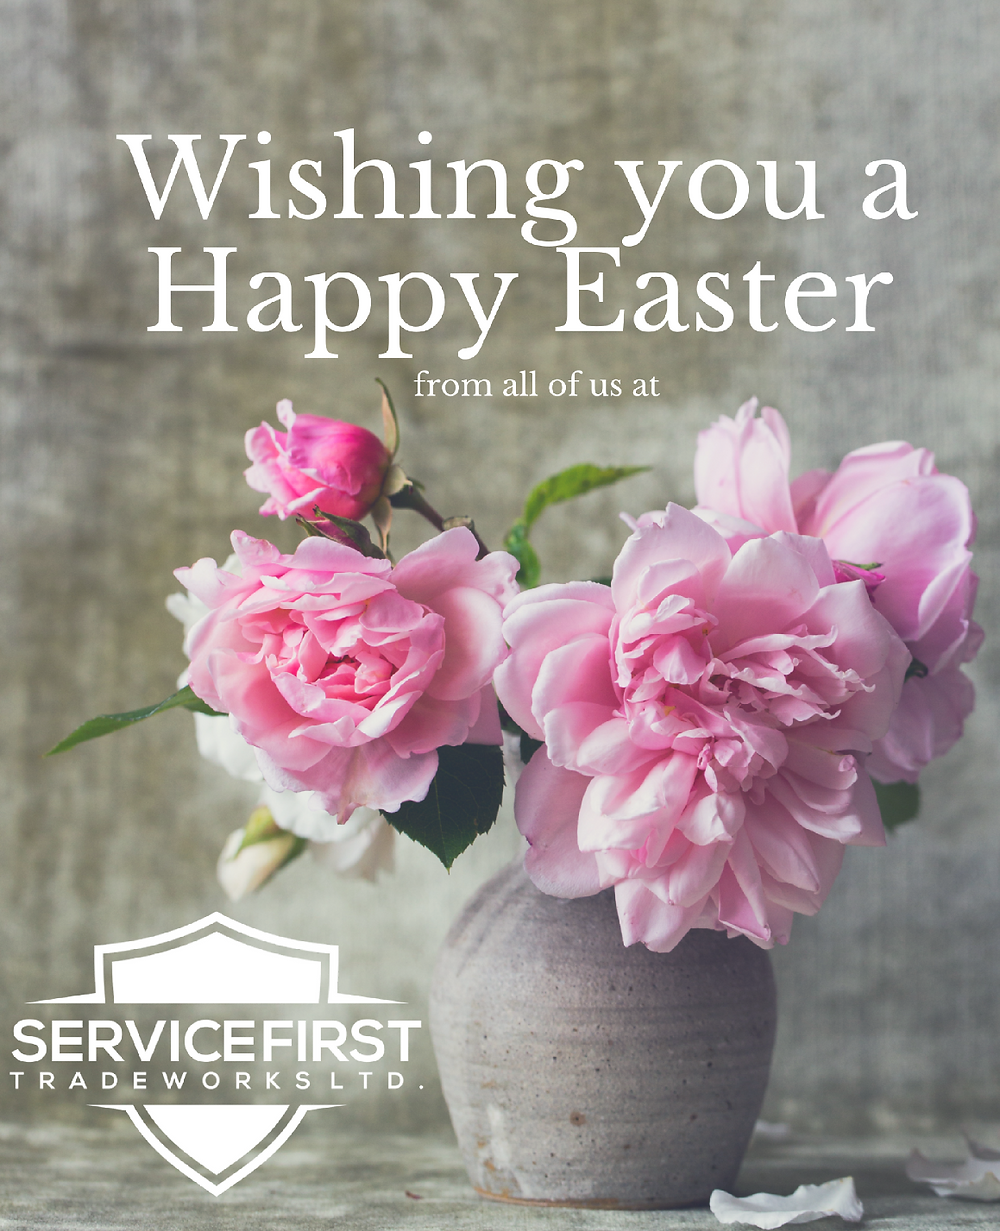 Easter Service First Tradeworks